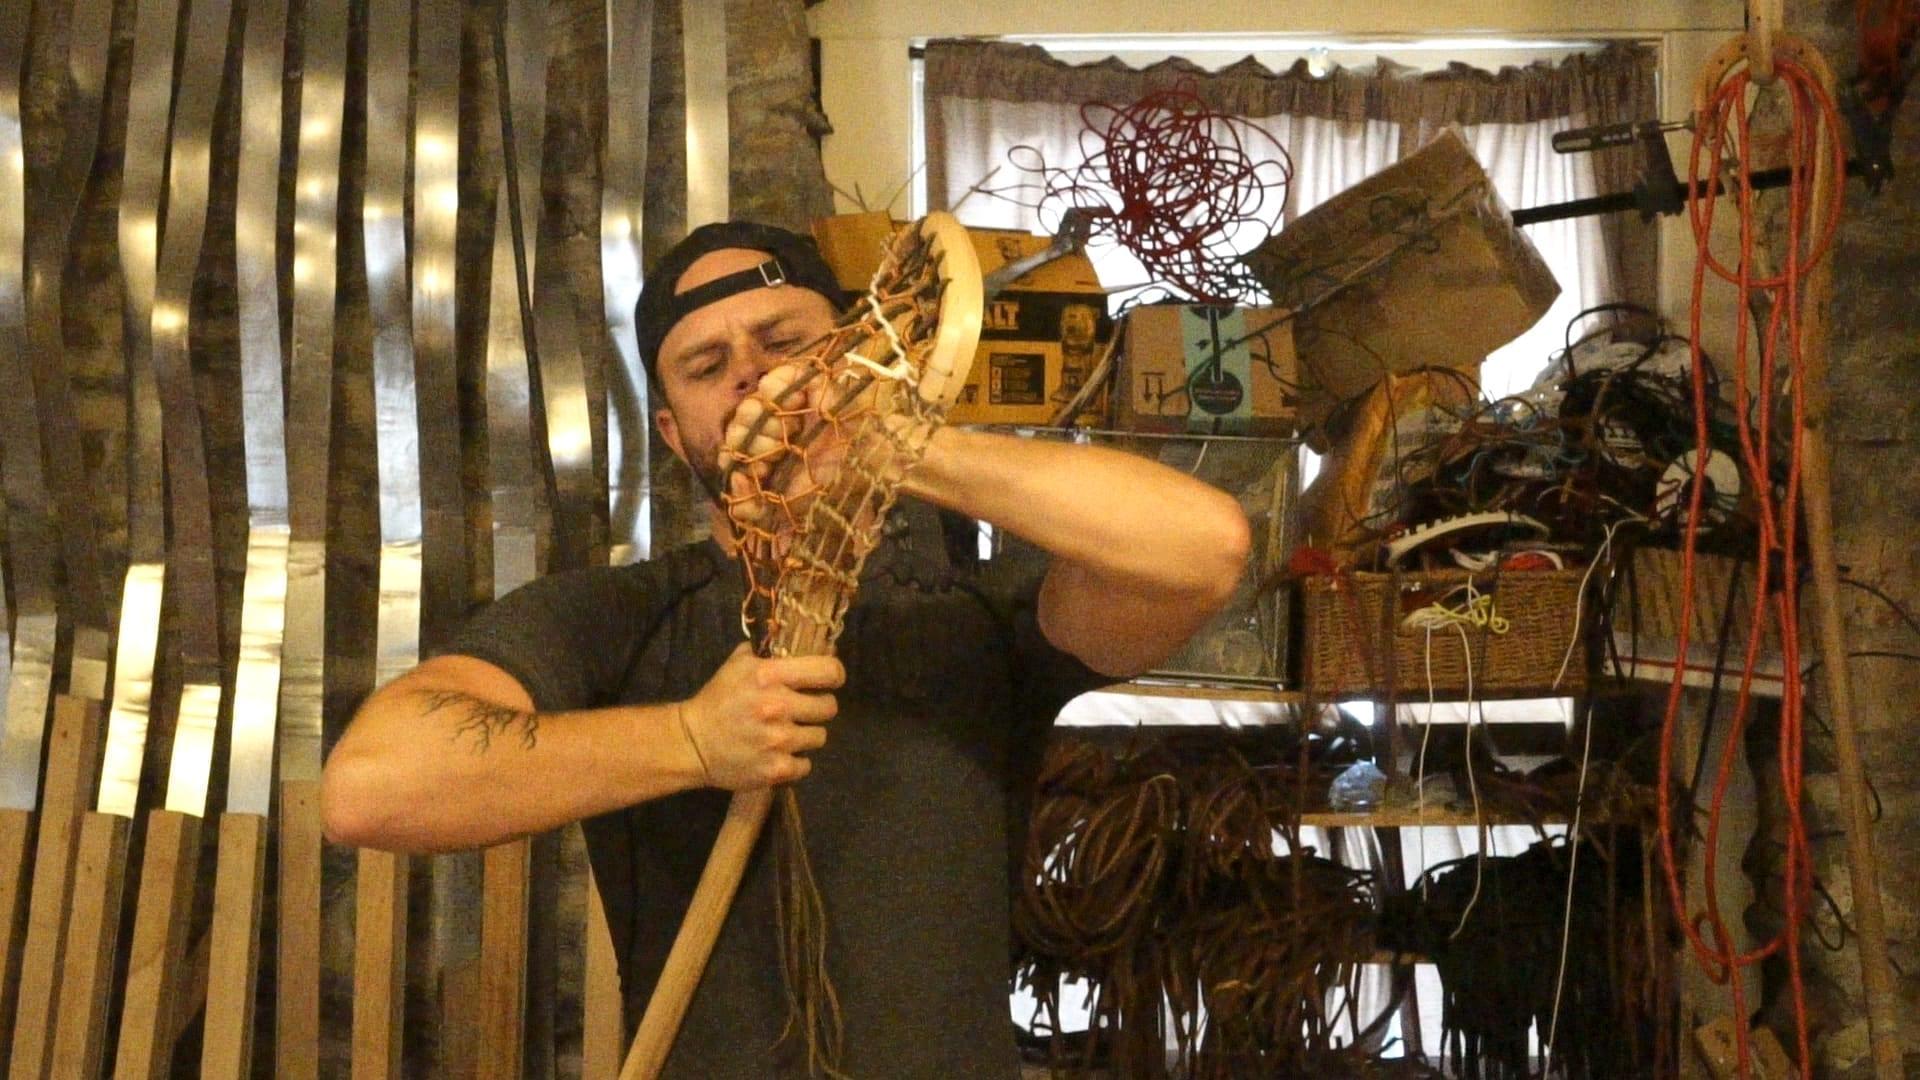 kevin corrigan's wood lacrosse stick justin skaggs notre dame mens lacrosse